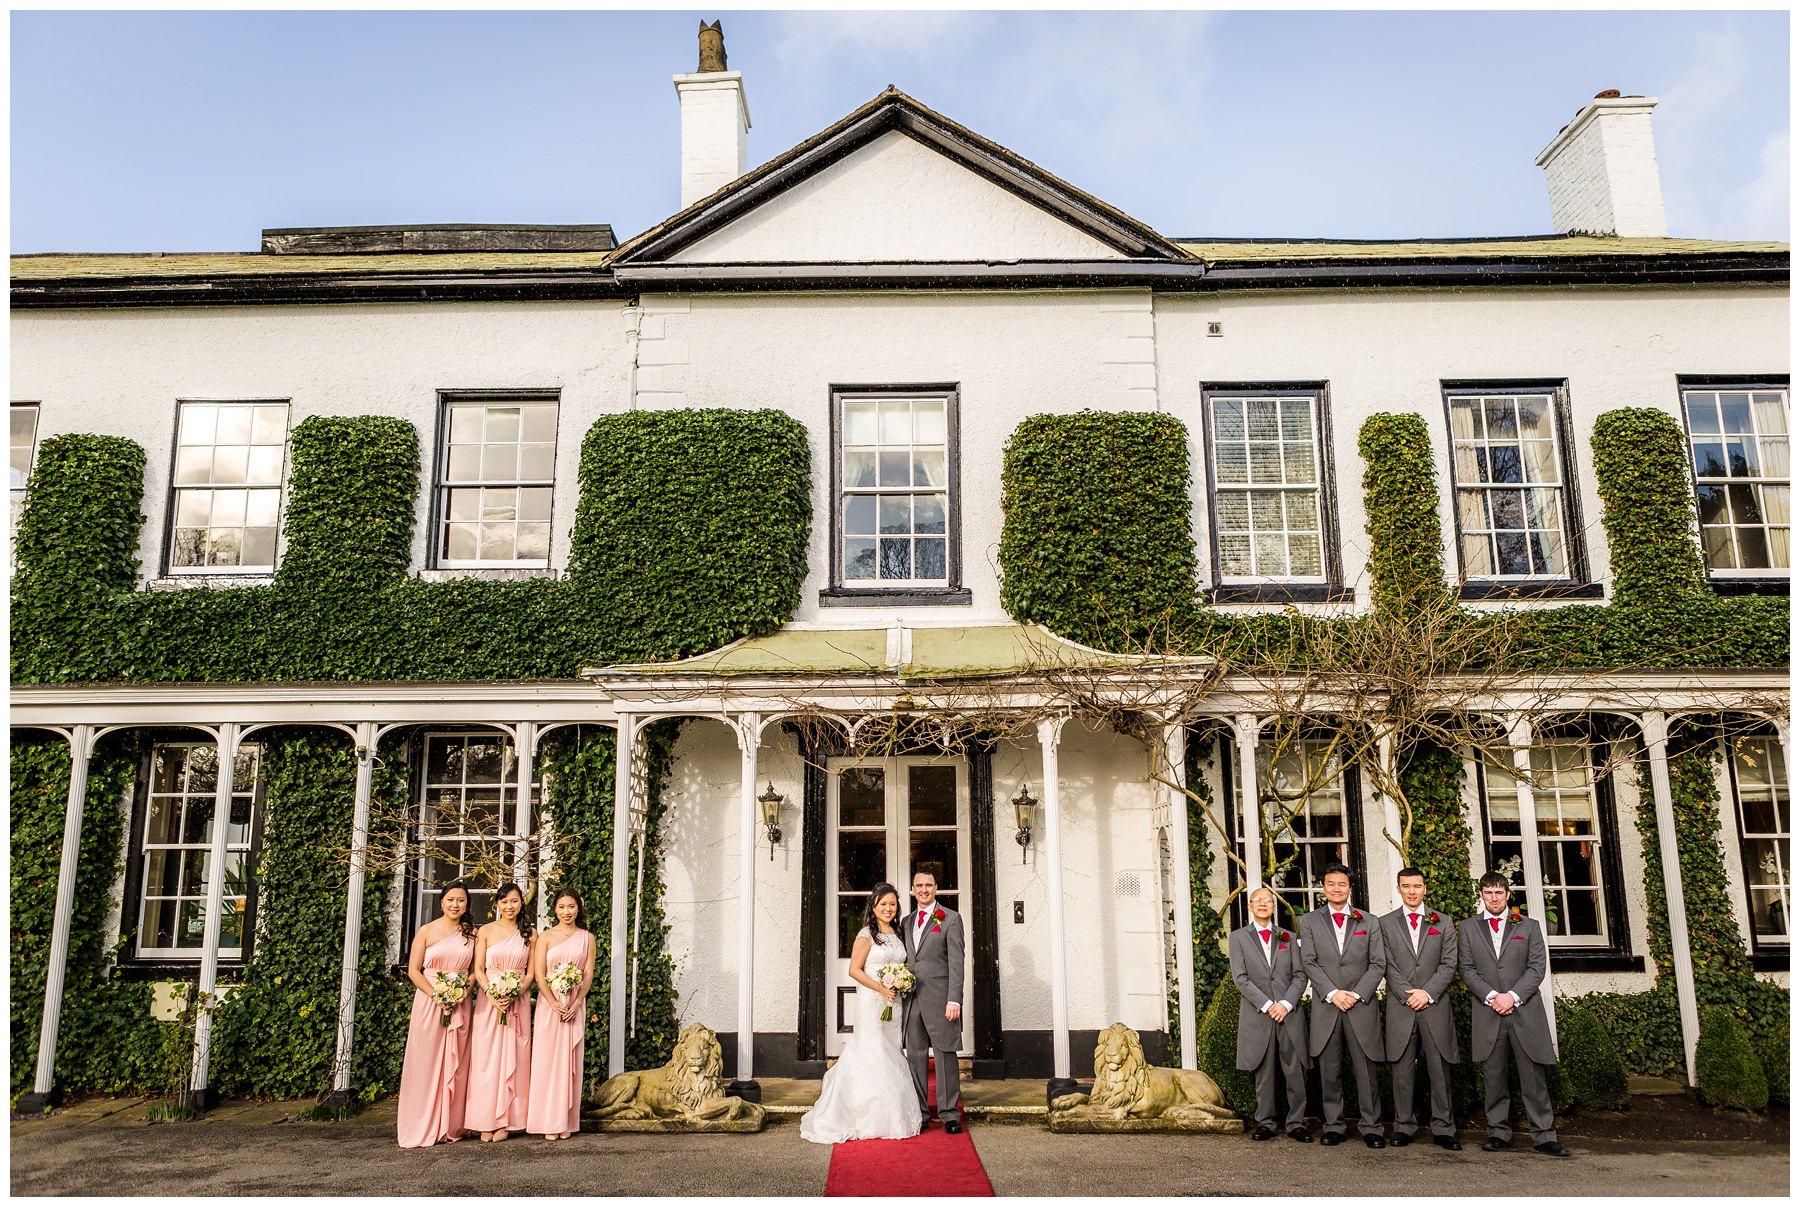 Statham-Lodge-Wedding-Photography_0018.jpg